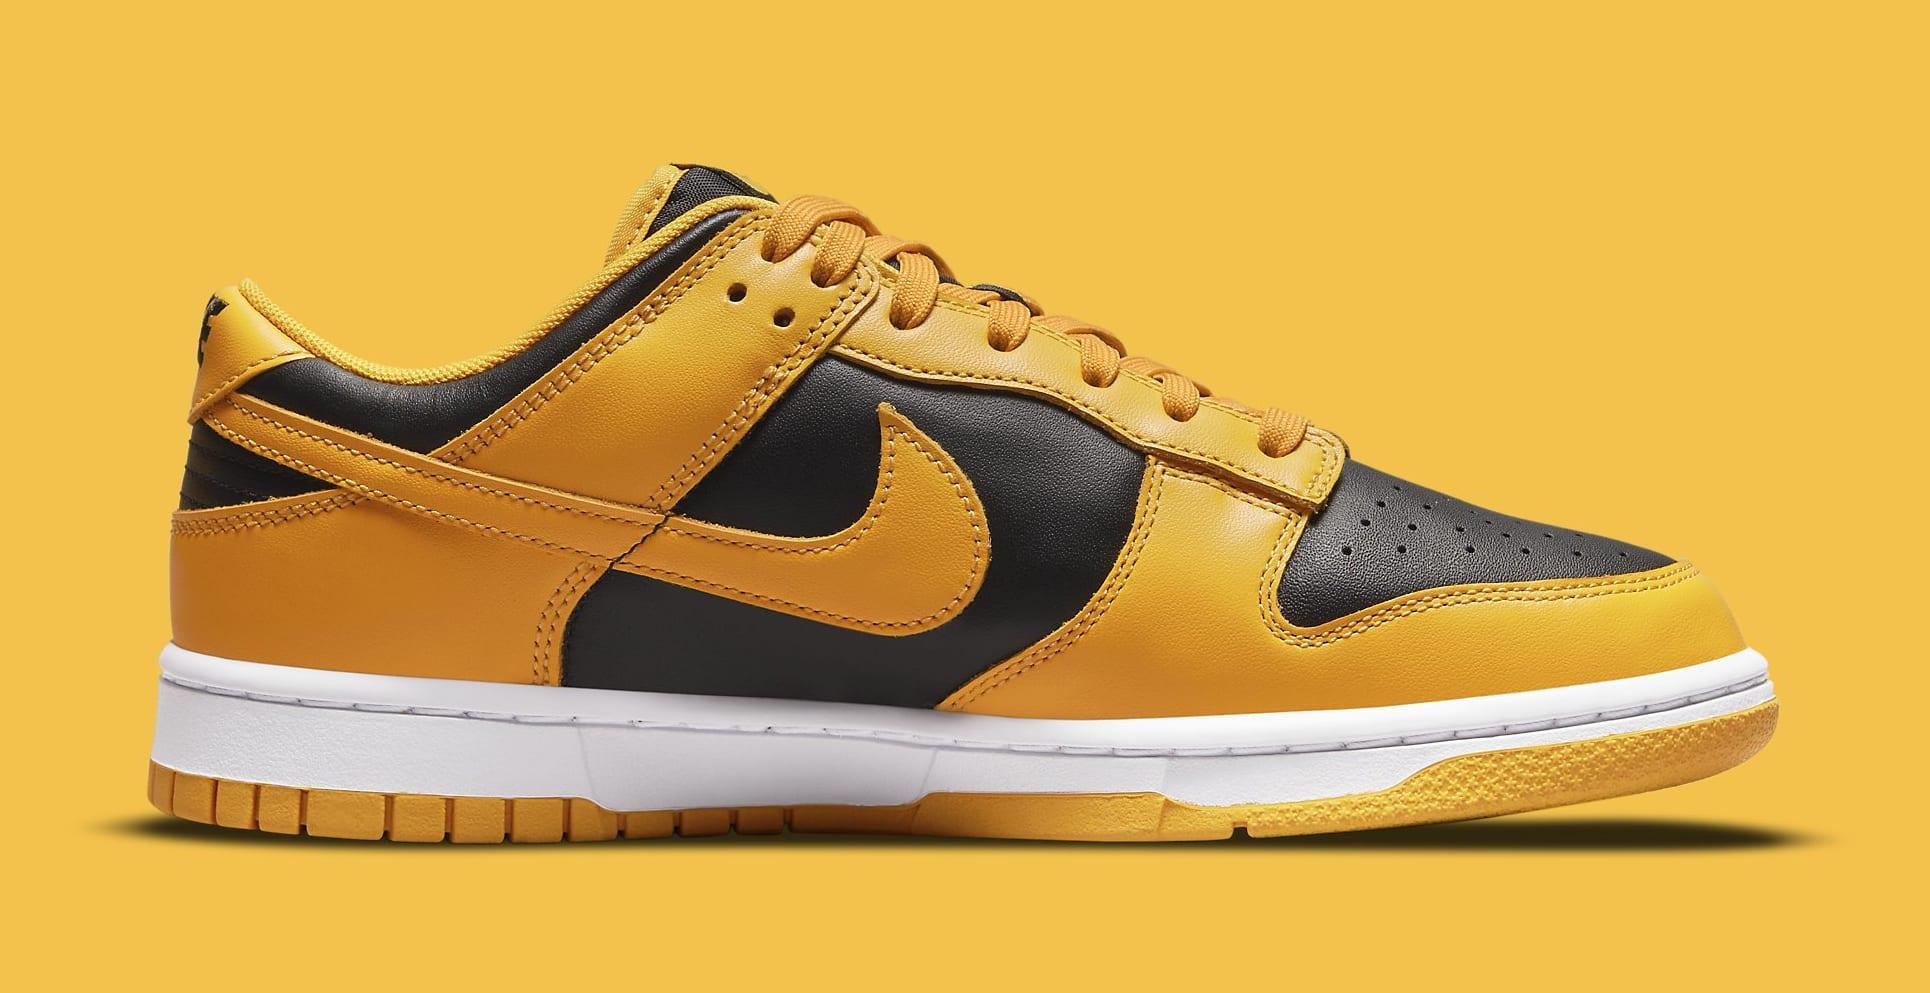 Nike Dunk Low 'Iowa' DD1391-004 (Medial)